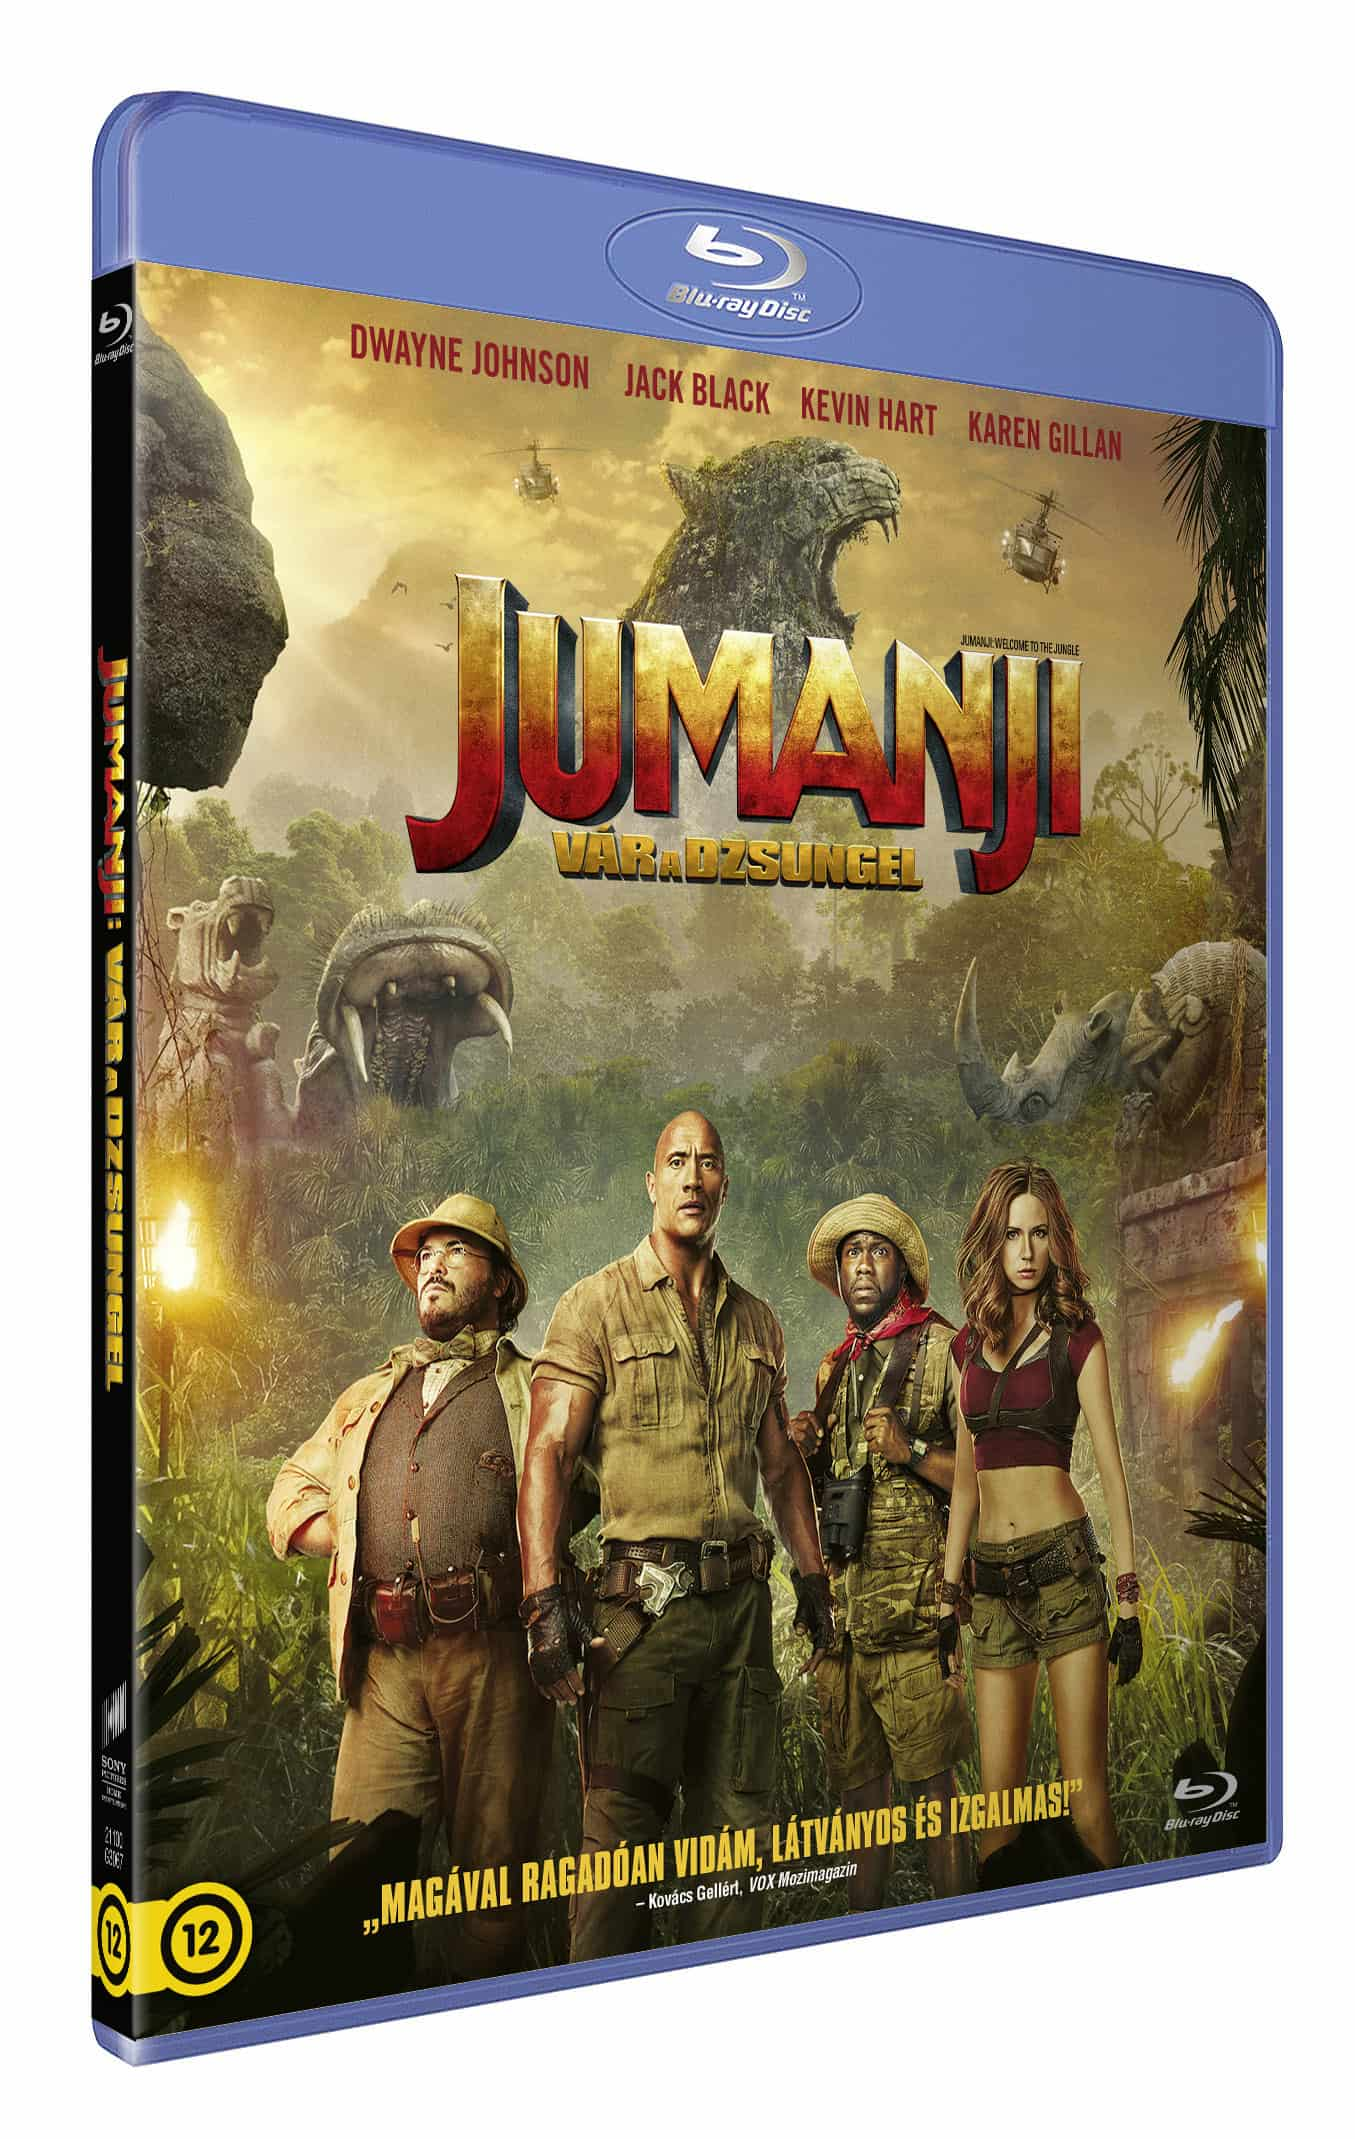 Jumanji - Vár a dzsungel - Blu-ray